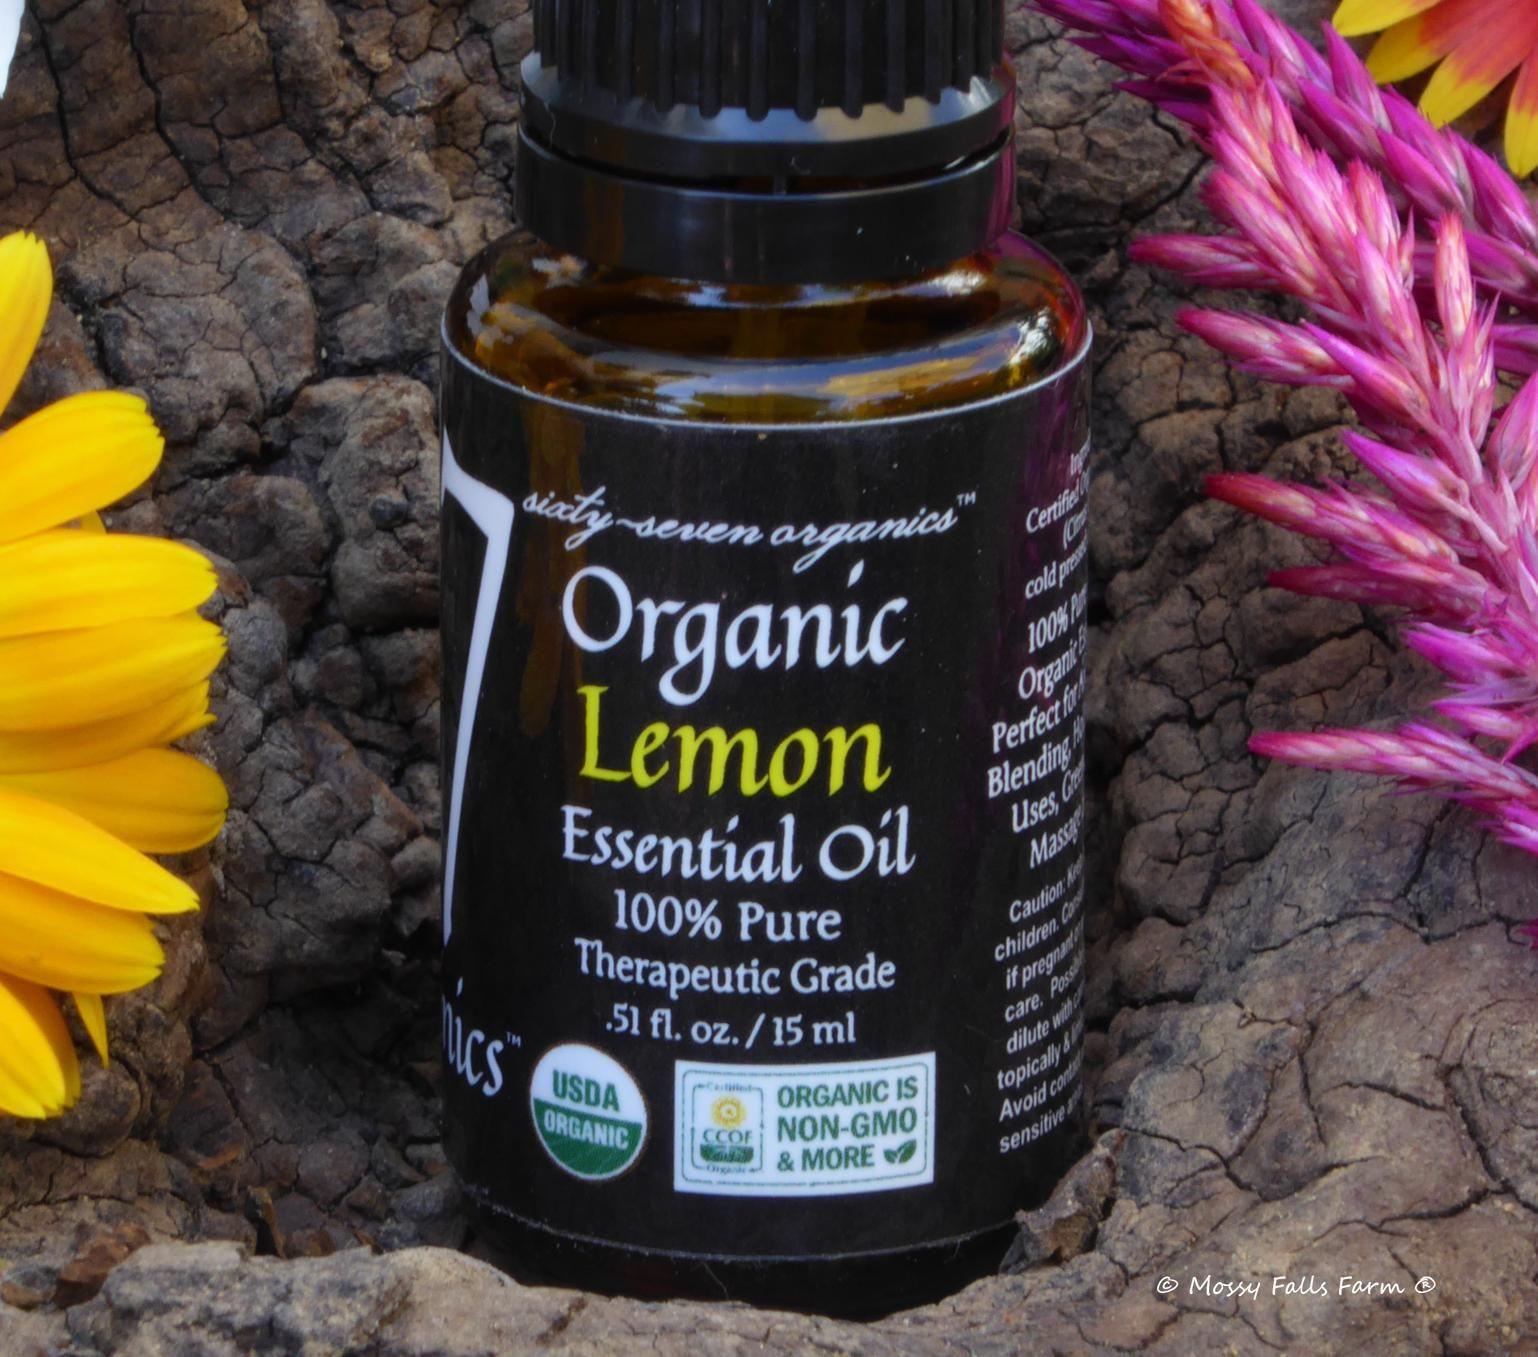 Organic Lemon Essential Oil Organic lemon, Essential oils